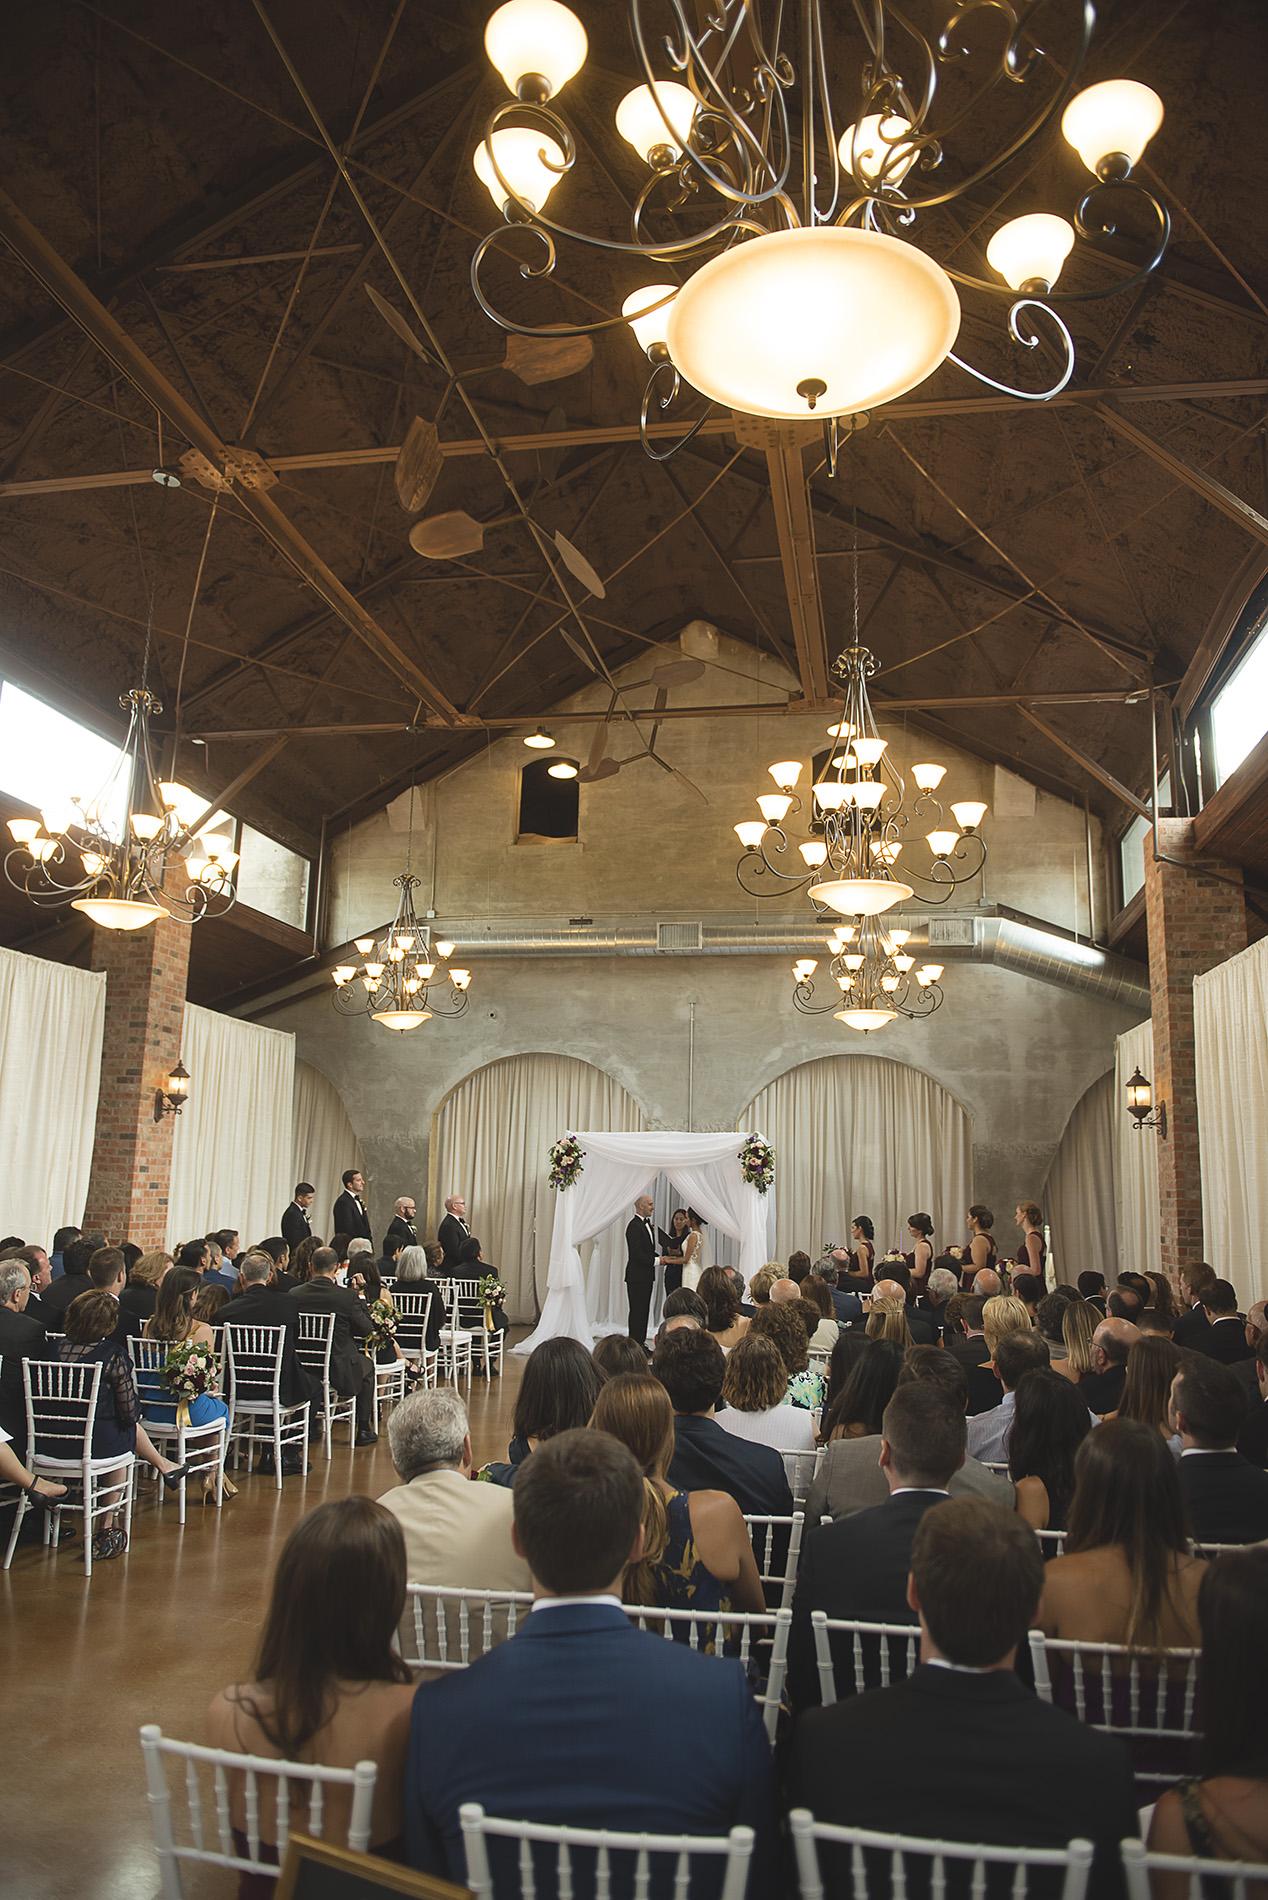 Houston-venue-Olde-Dobbin-Station-Romantic-Classic-Wedding-Photographer-061.jpg